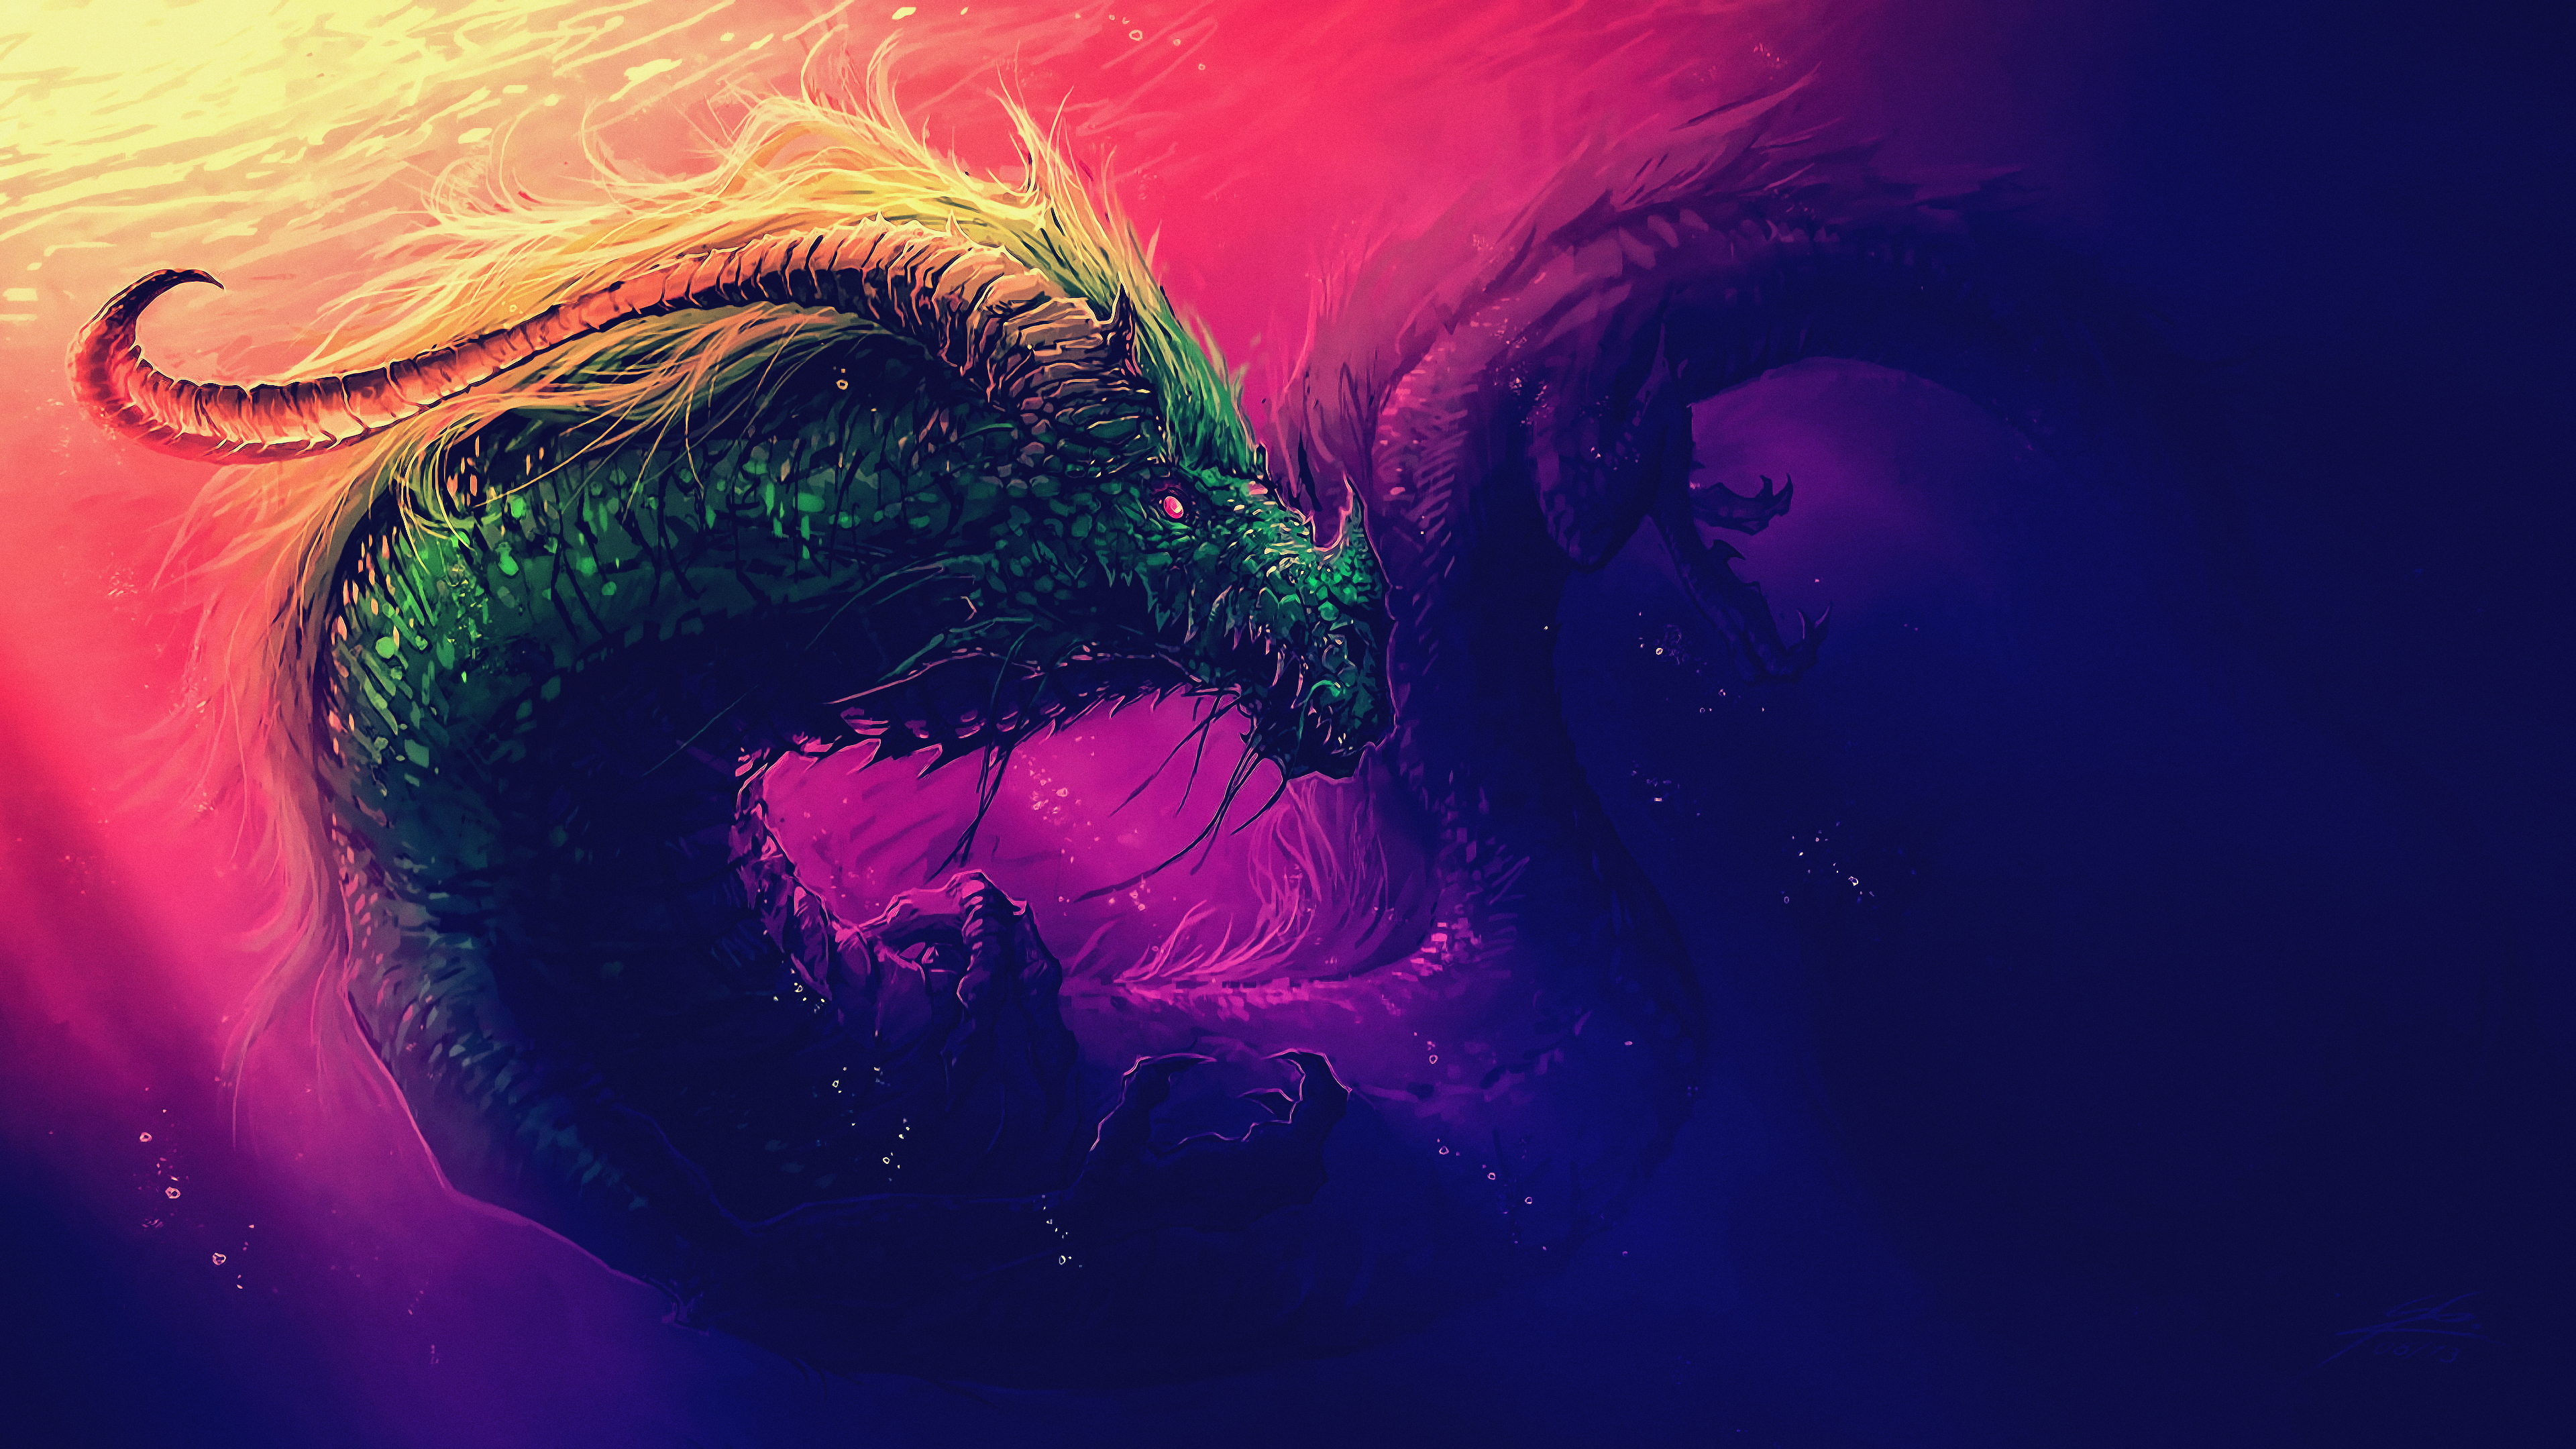 sea serpent digital art 4k 1540756226 - Sea Serpent Digital Art 4k - sea serpent wallpapers, hd-wallpapers, fantasy wallpapers, digital art wallpapers, creature wallpapers, artwork wallpapers, artist wallpapers, 4k-wallpapers